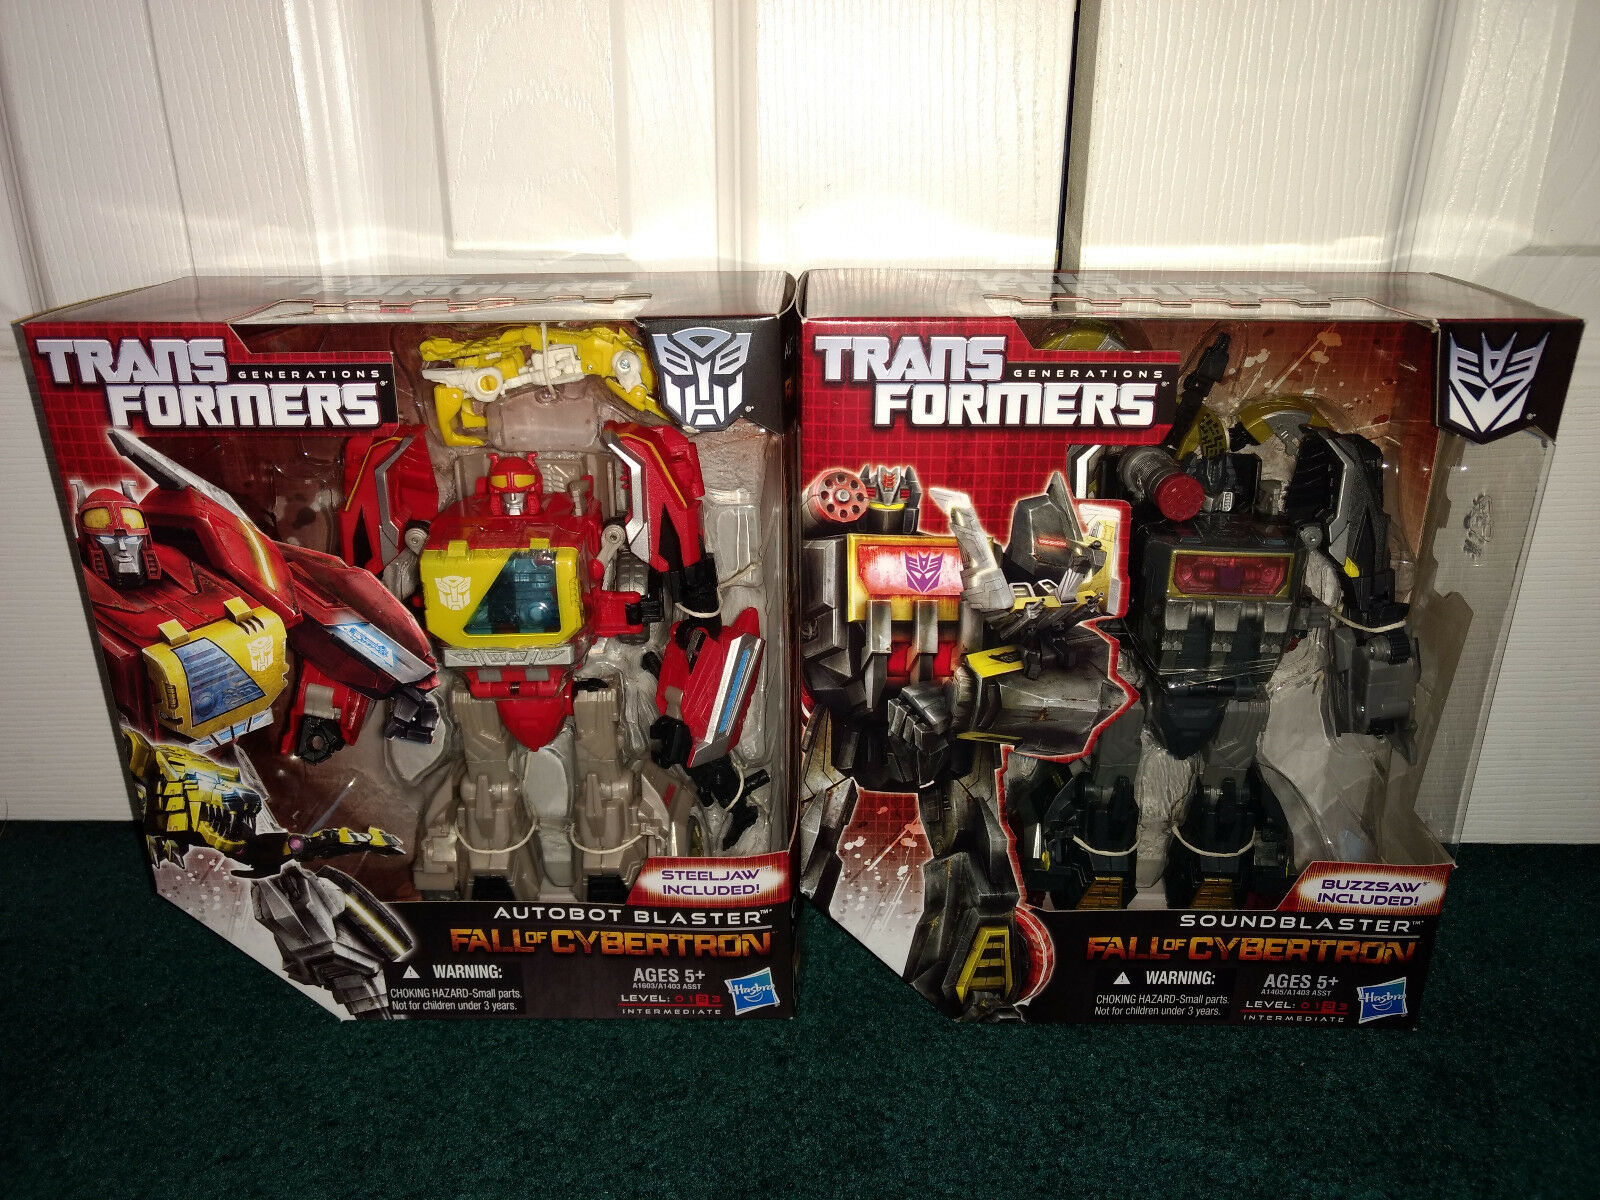 Blaster Steeljaw + Soundblaster Buzzsaw Transformers FOC Generations Hasbro 2012